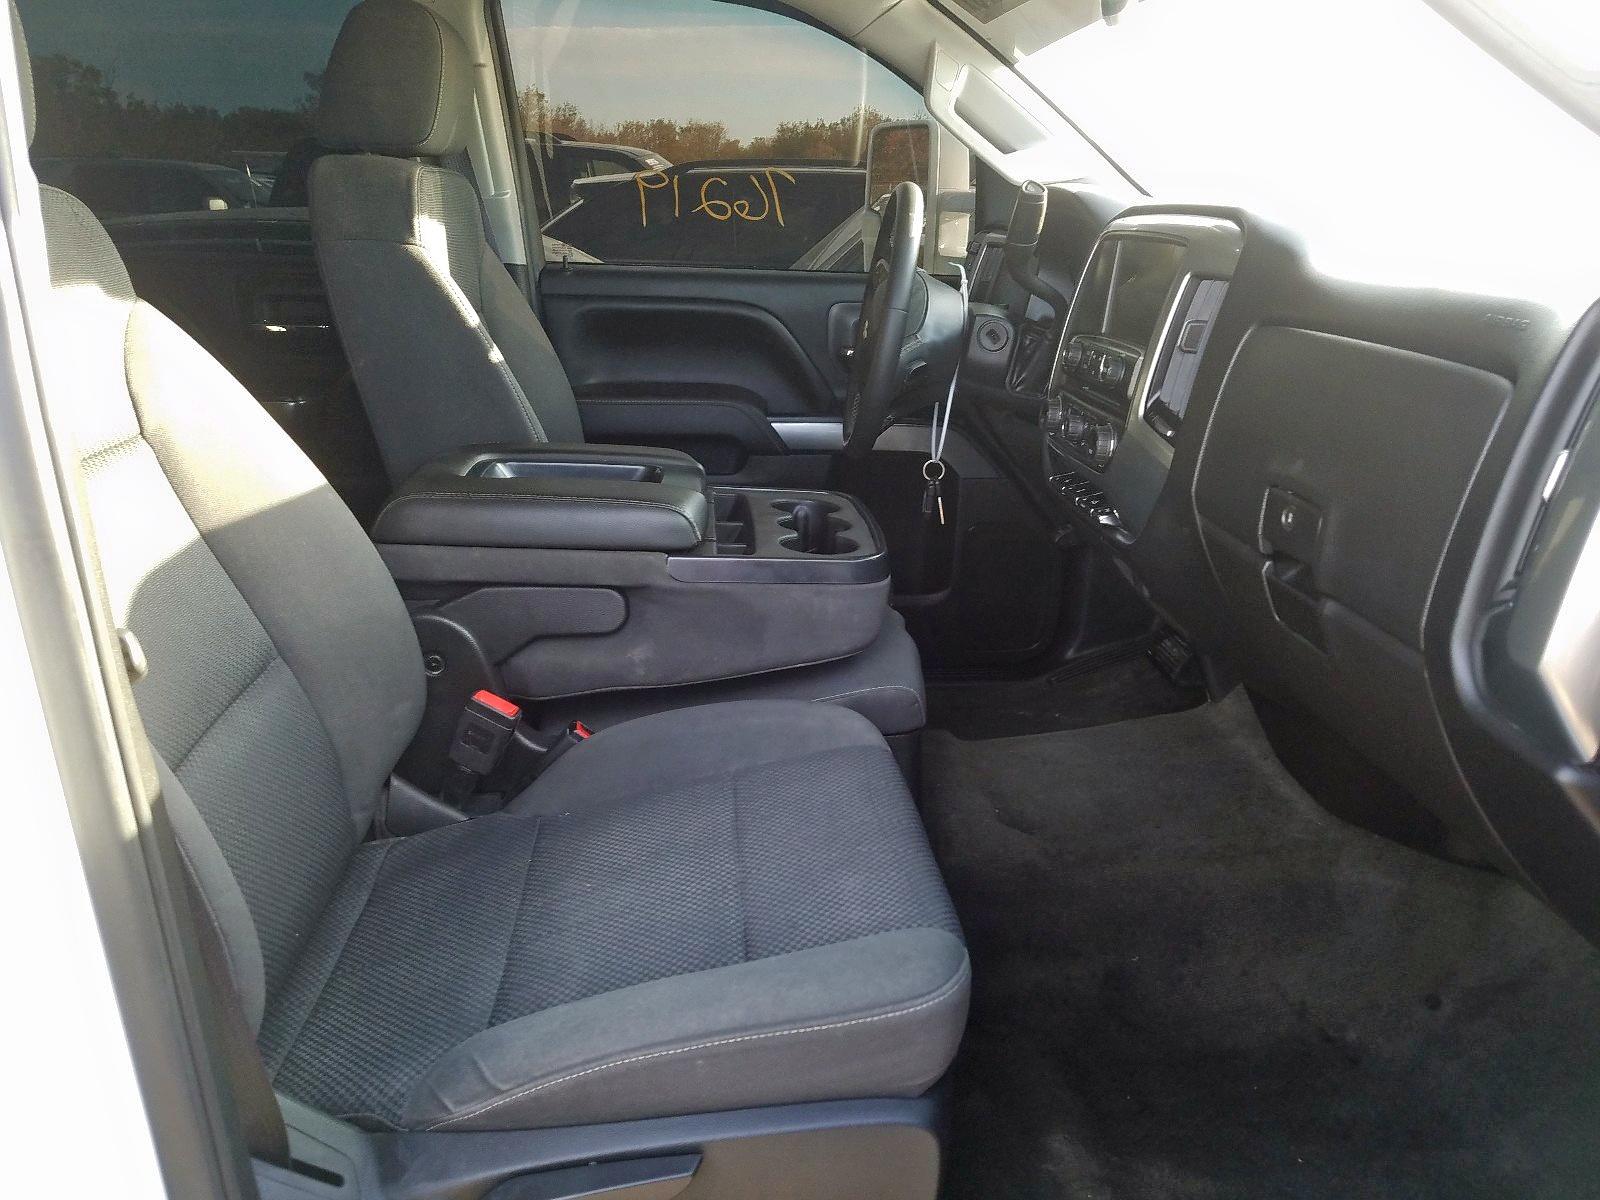 1GC1CVEG1GF279626 - 2016 Chevrolet Silverado 6.0L close up View